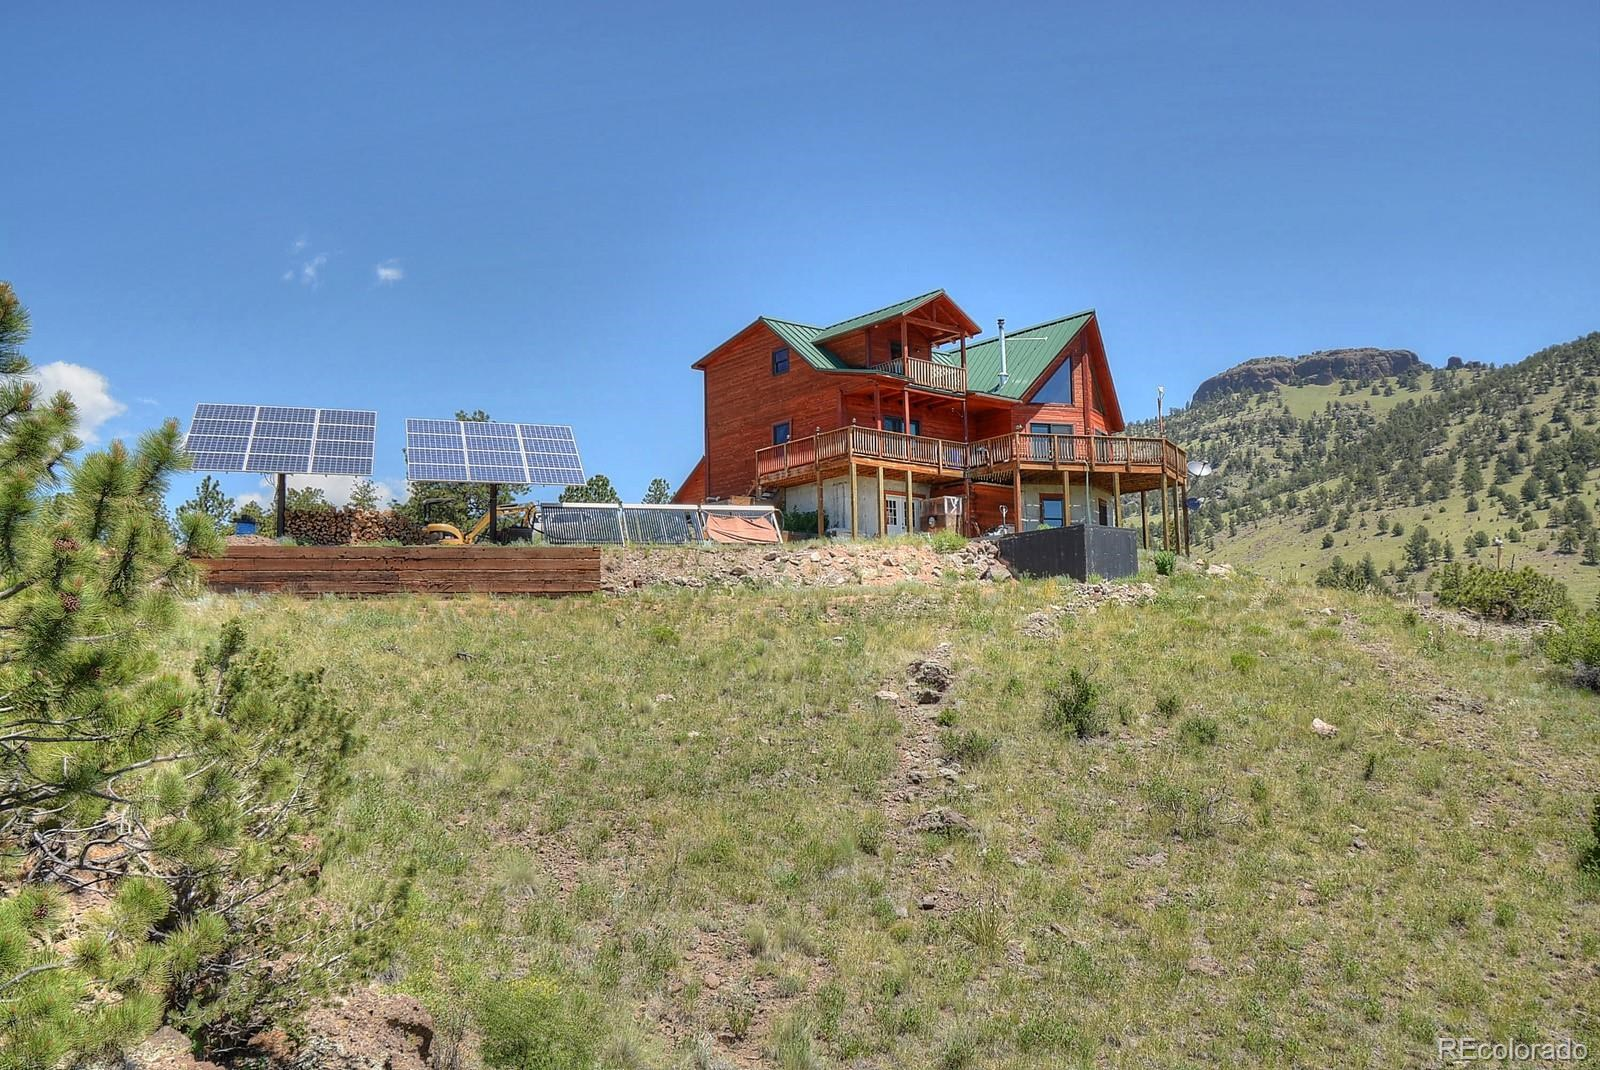 MLS# 8182693 - 4 - 396 Eagle Nest Trail, Guffey, CO 80820